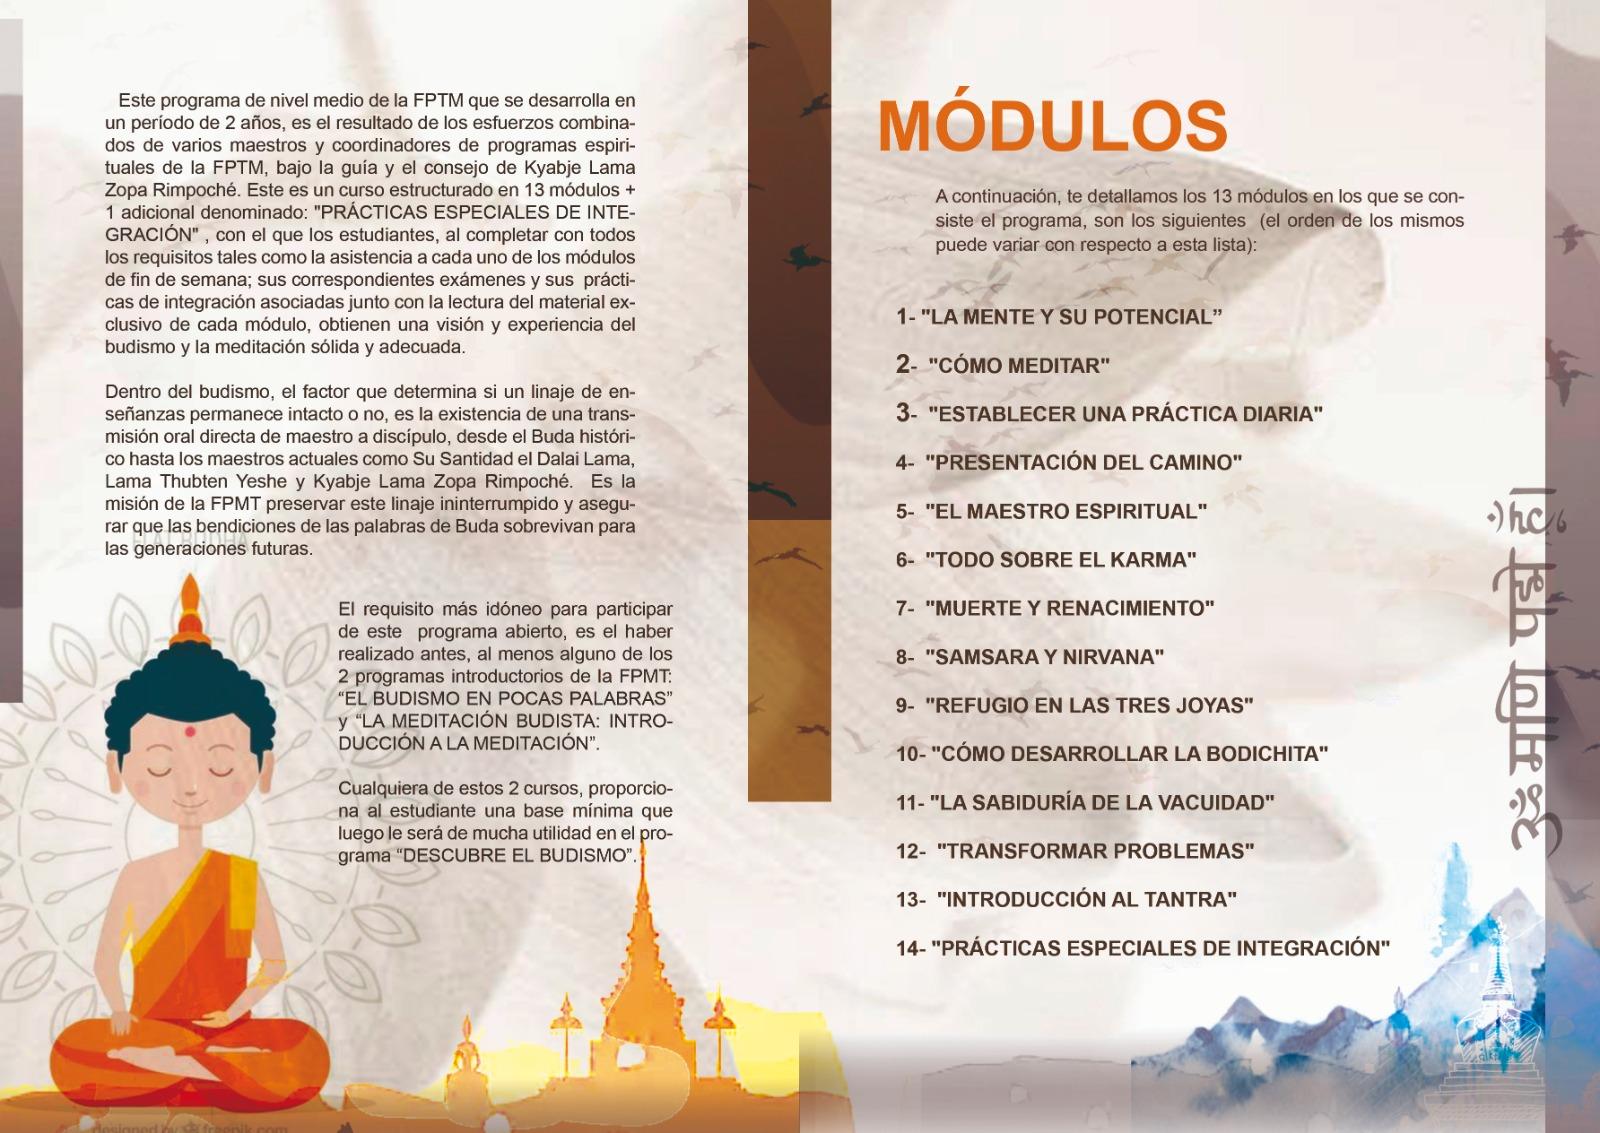 Descubre el budismo 2